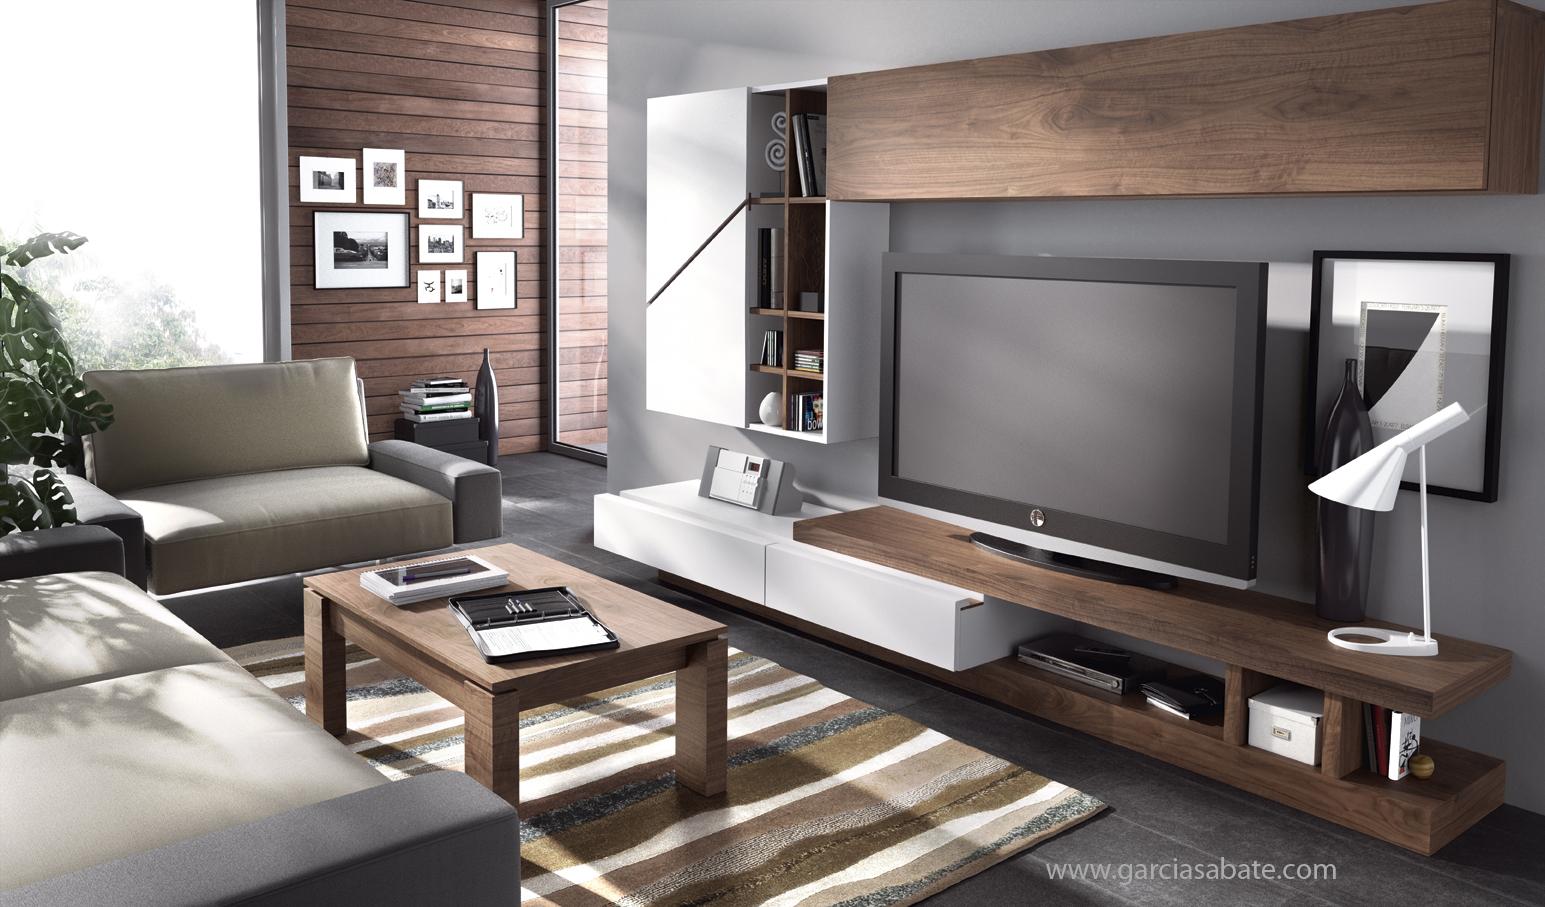 Emejing Muebles Comedor Diseño Moderno Ideas - Casas: Ideas ...